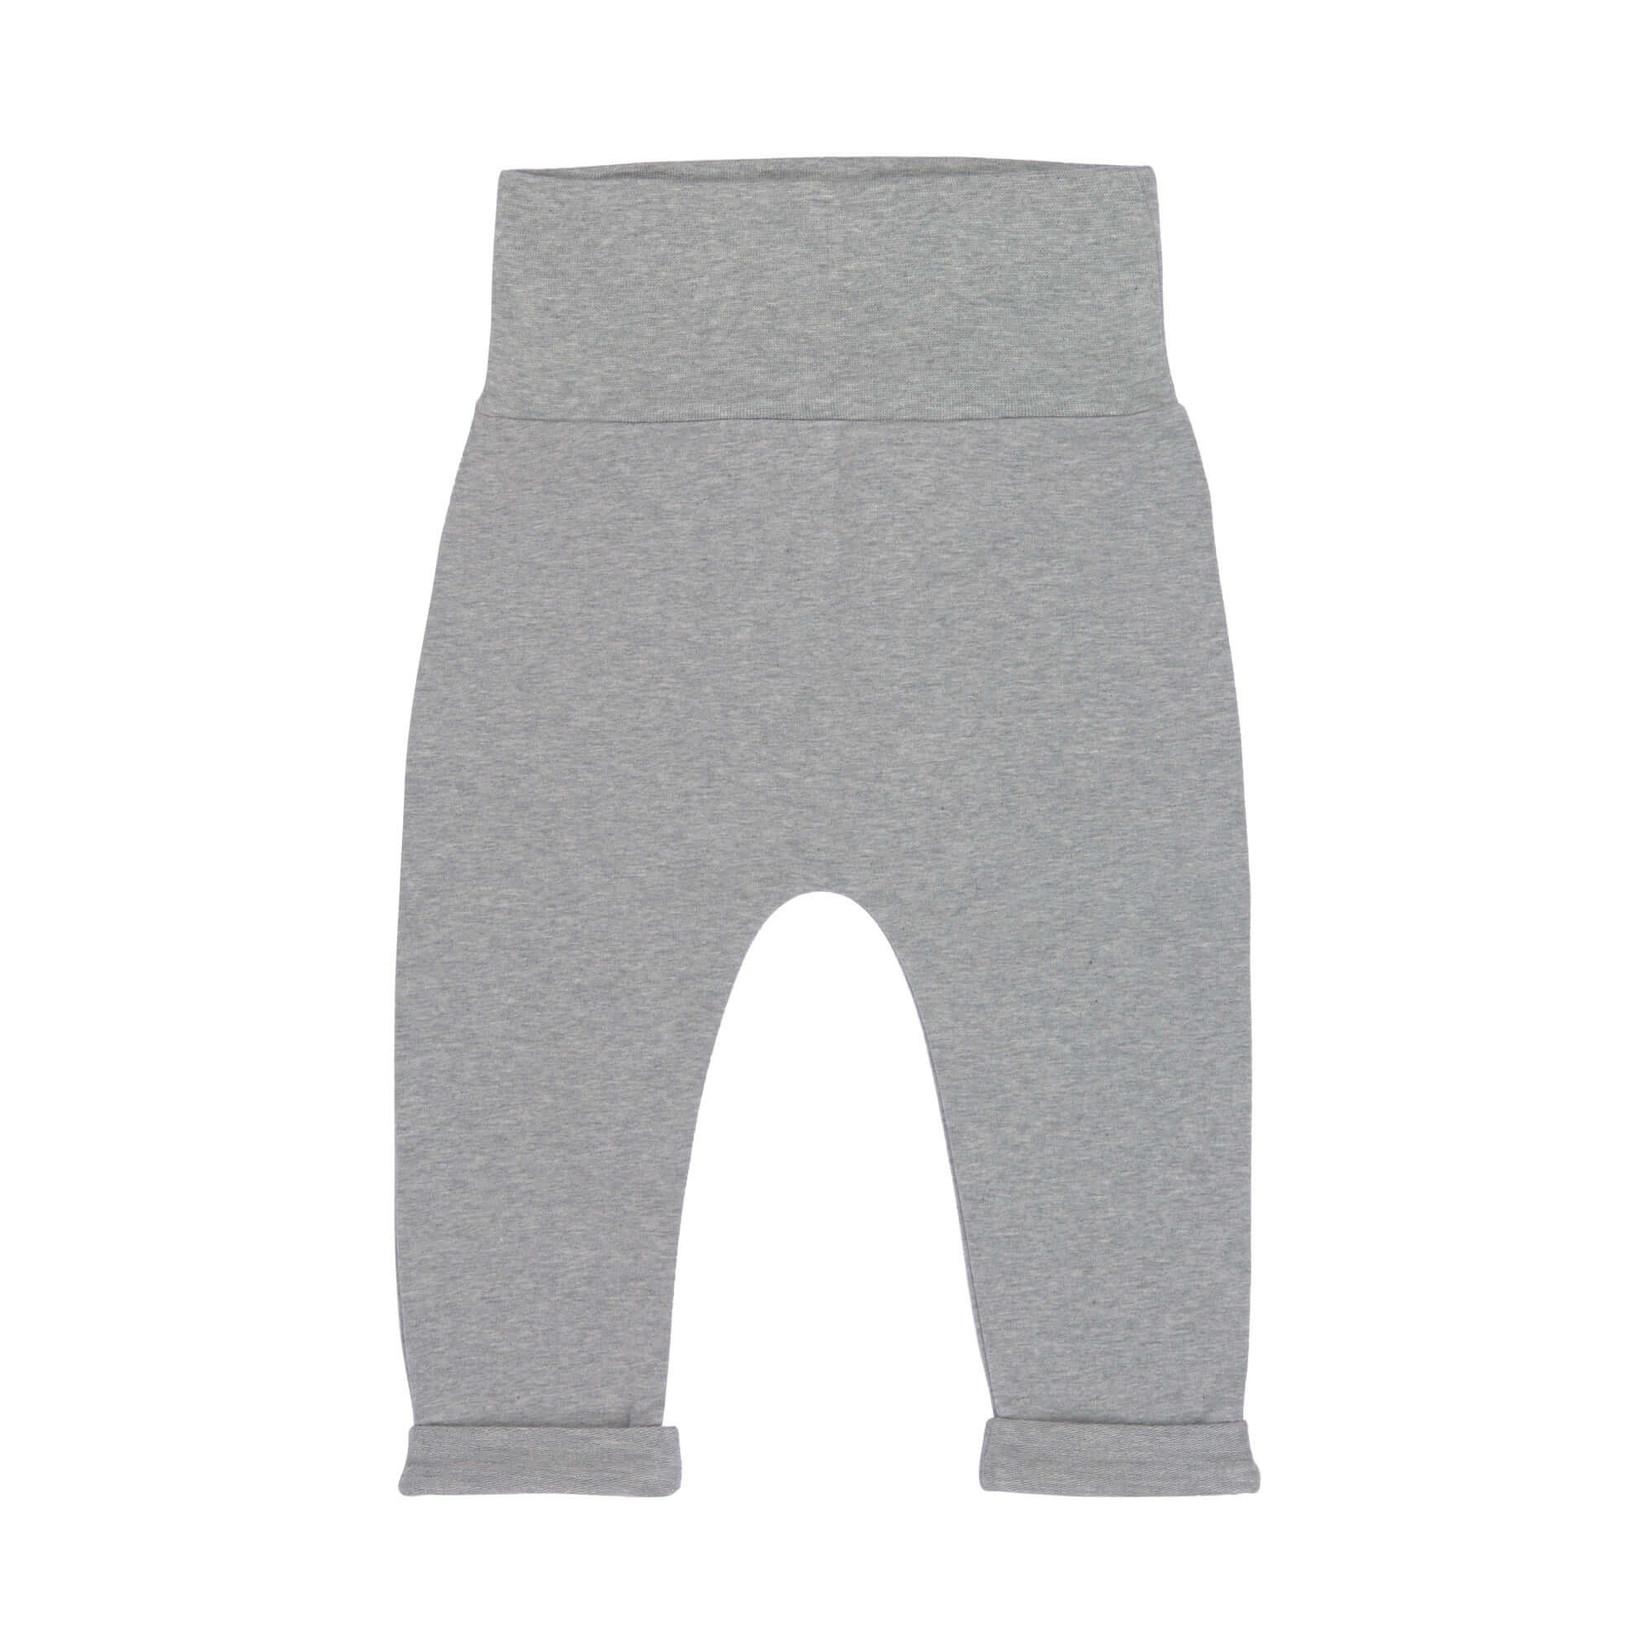 Lässig Pants Gots Heather Grey